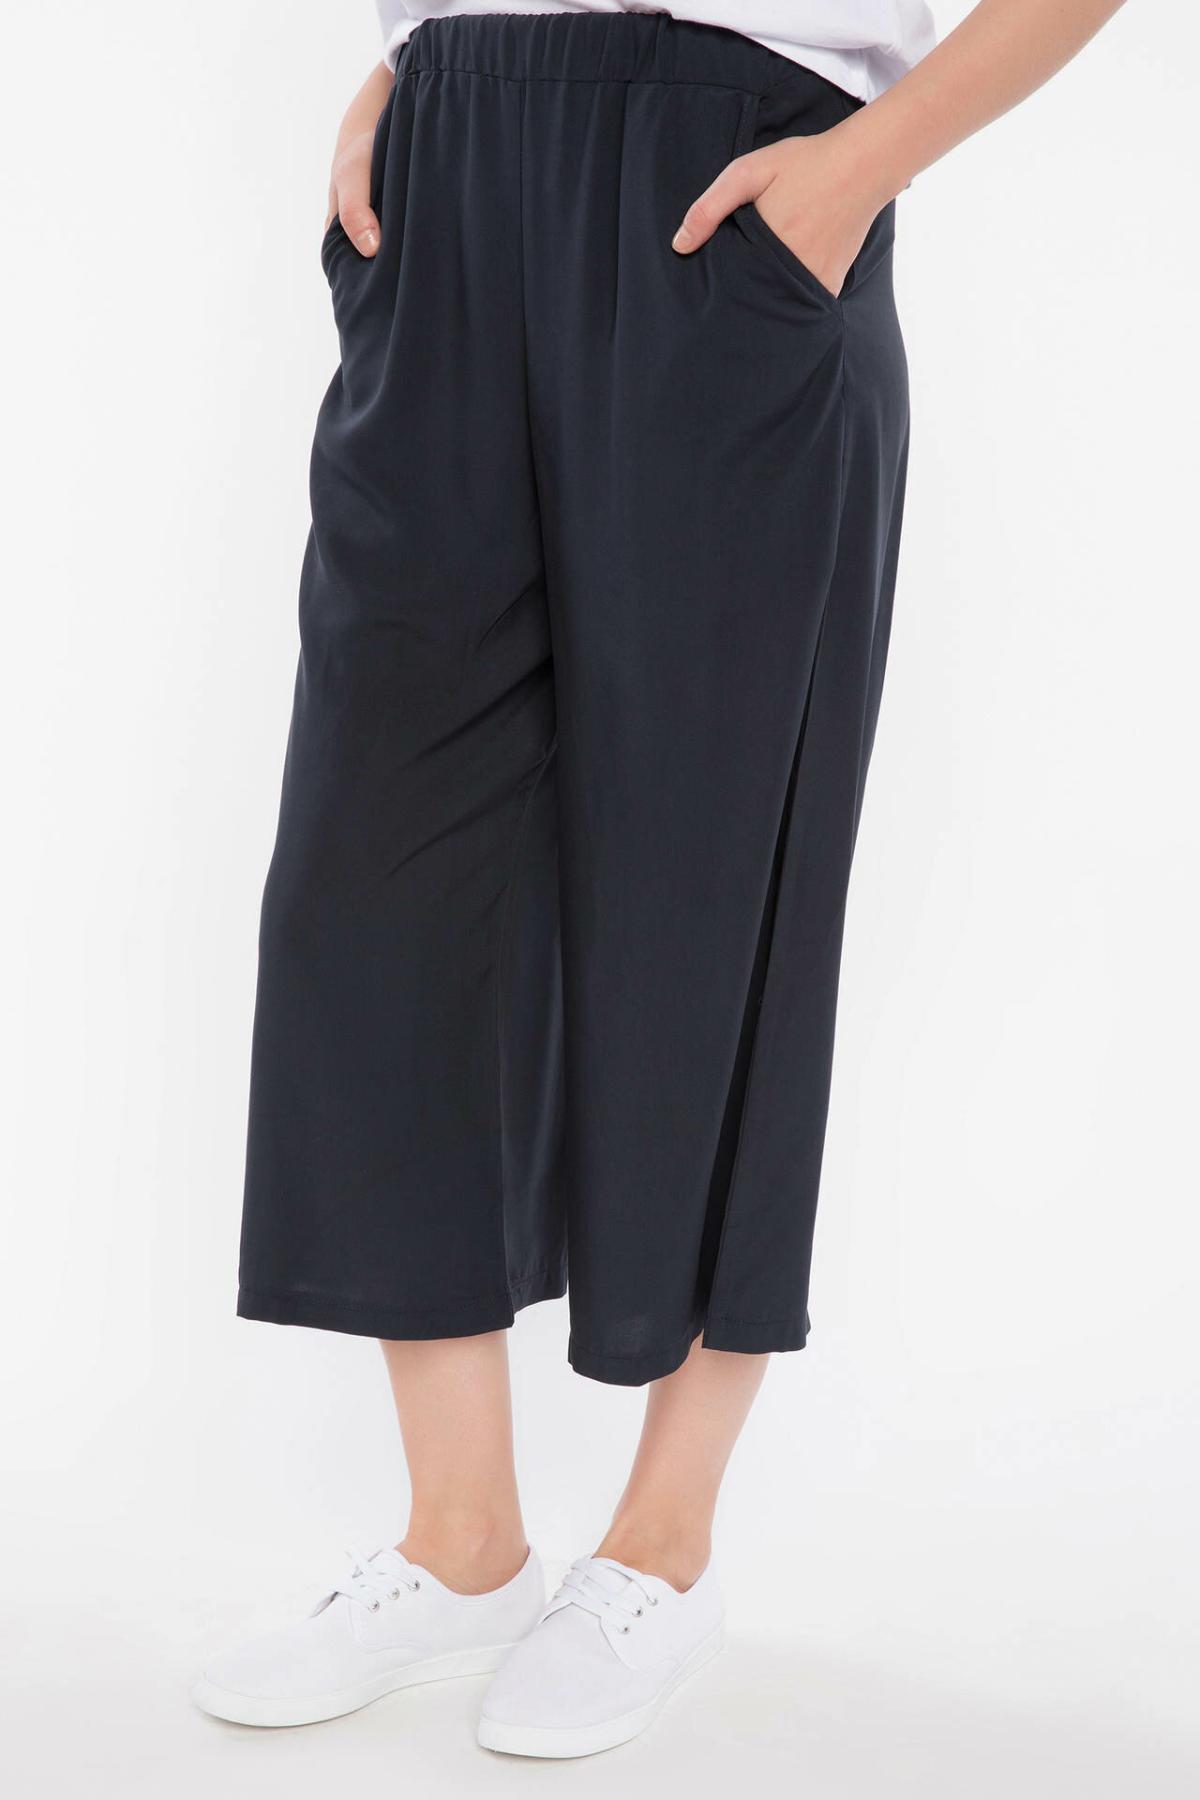 DeFacto Woman Summer Wide-leg Ninth Pants Women Casual Elastic Black Bottoms Female LooseTrousers-I3761AZ18SM